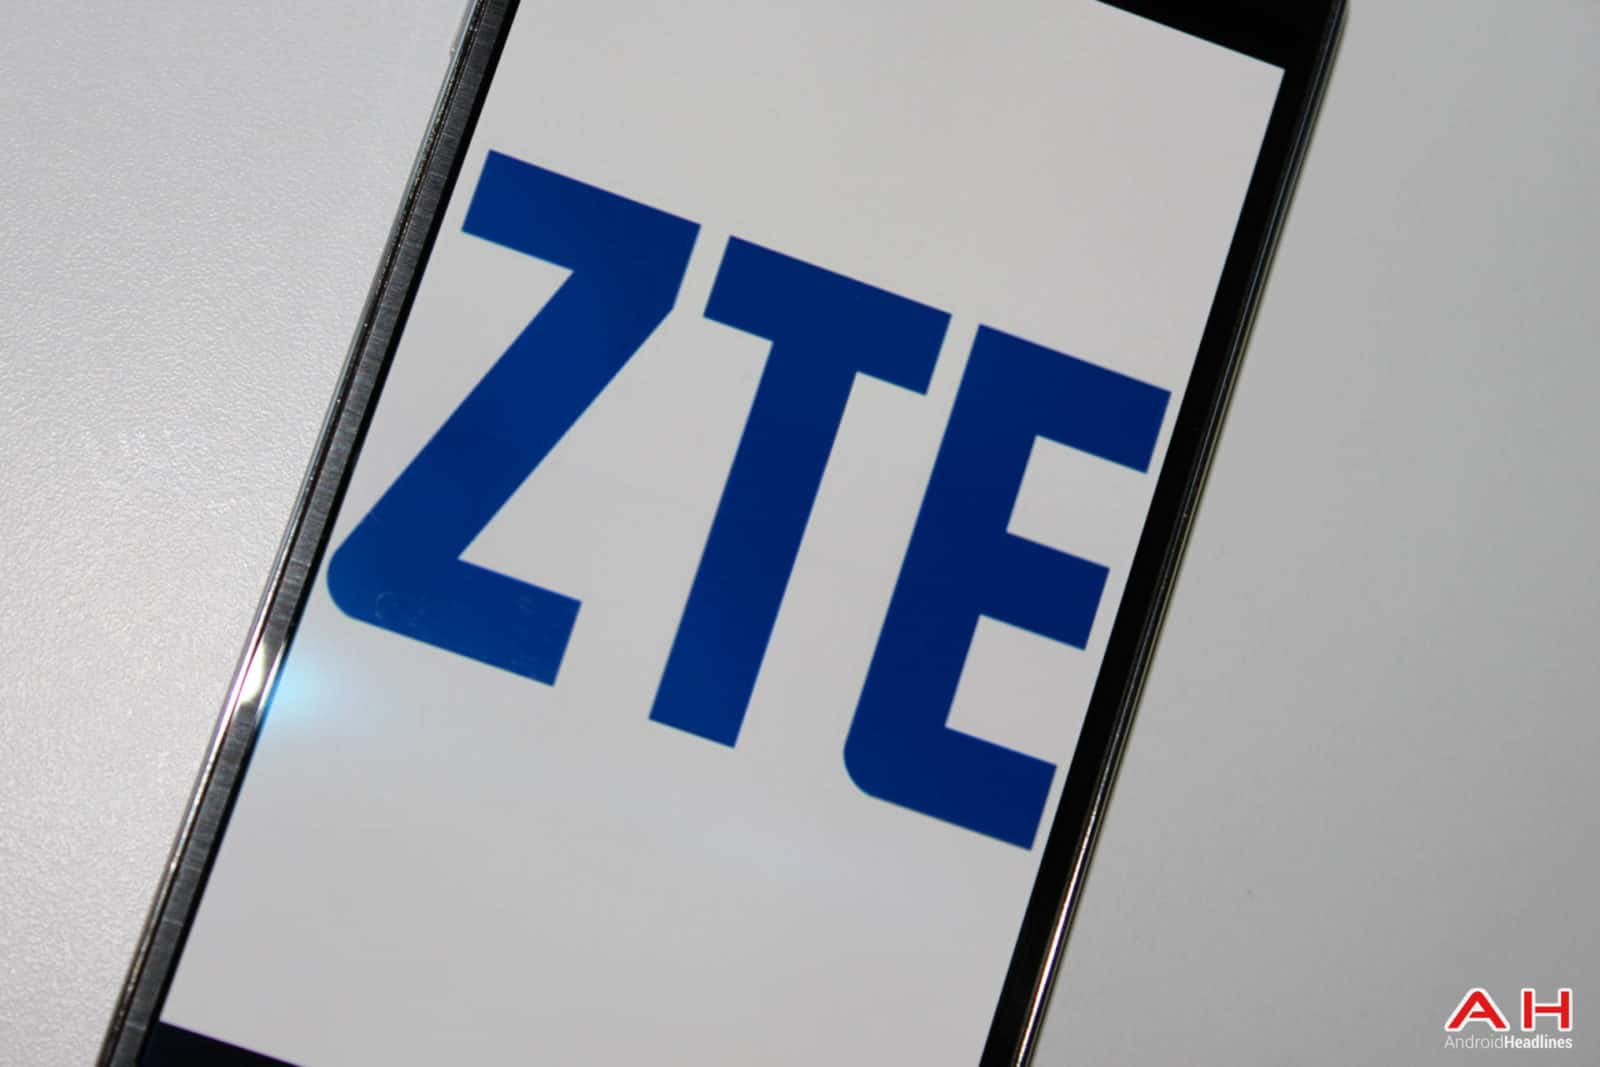 AH ZTE Logo 1.4